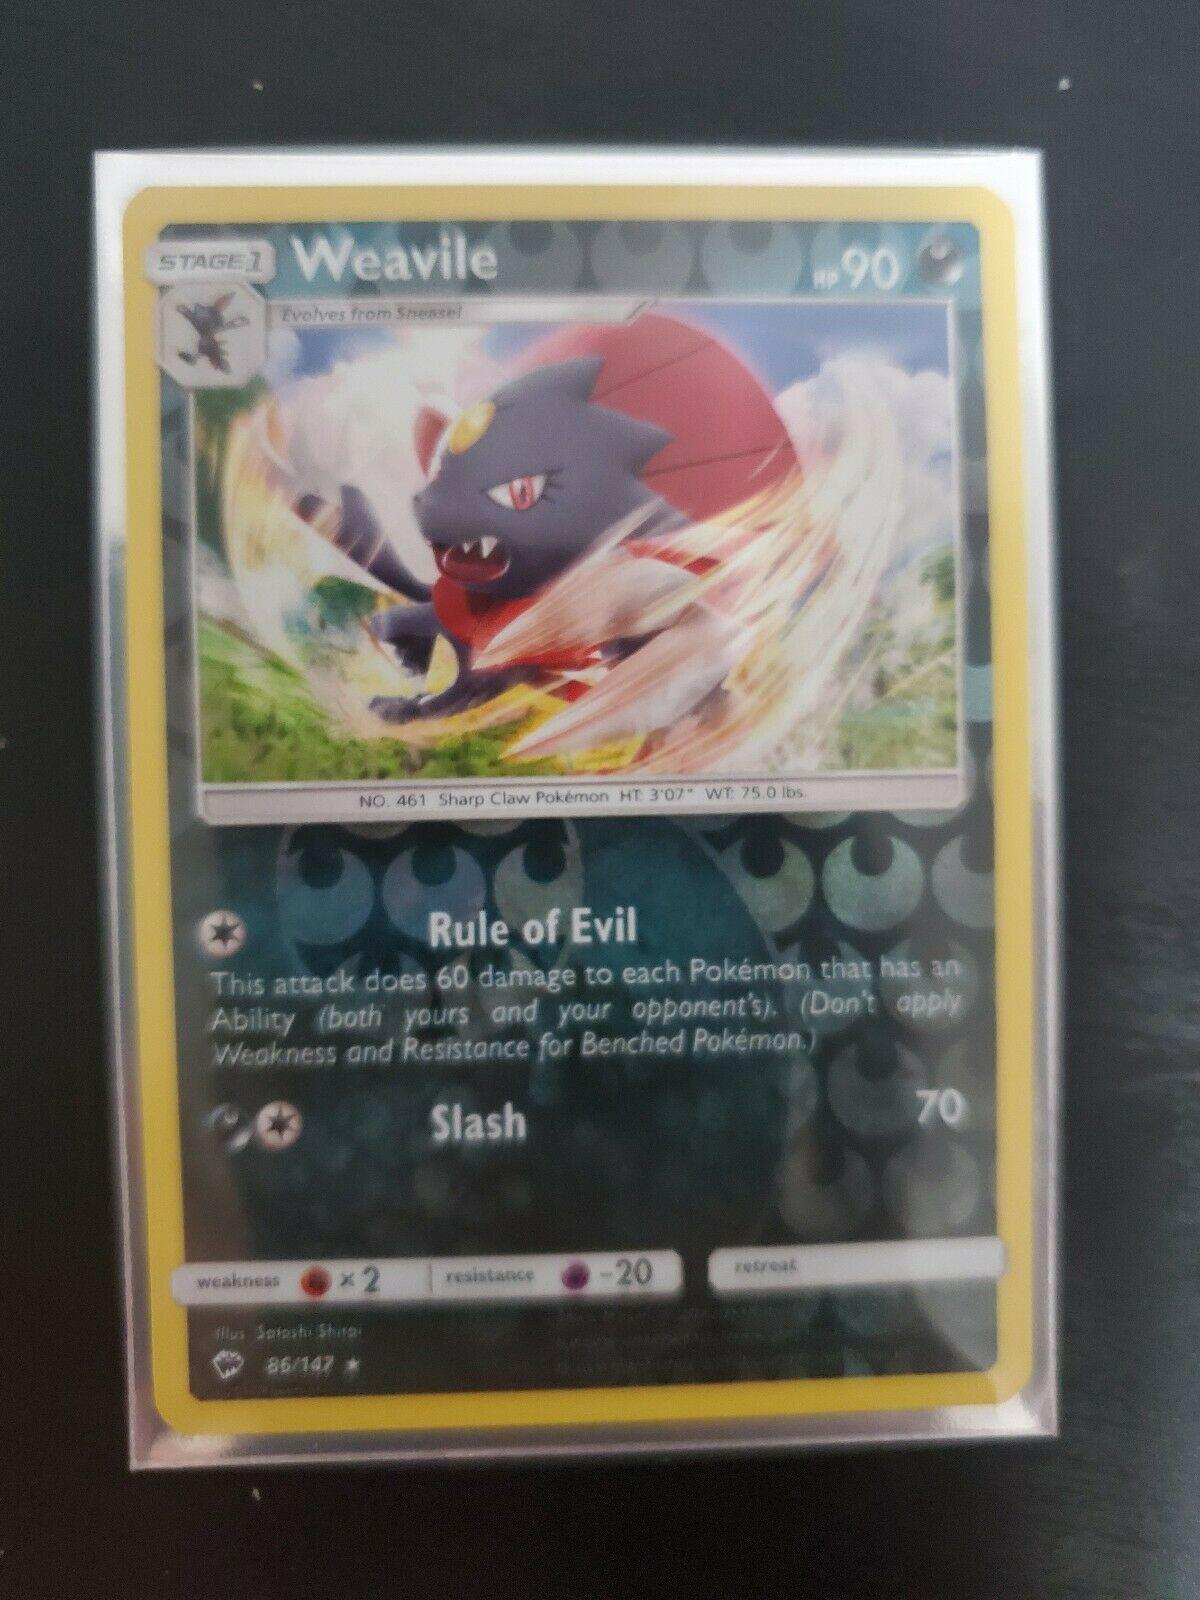 Weavile 86/147 Burning Shadows Reverse Holo Rare NM Pokemon Card - Image 1